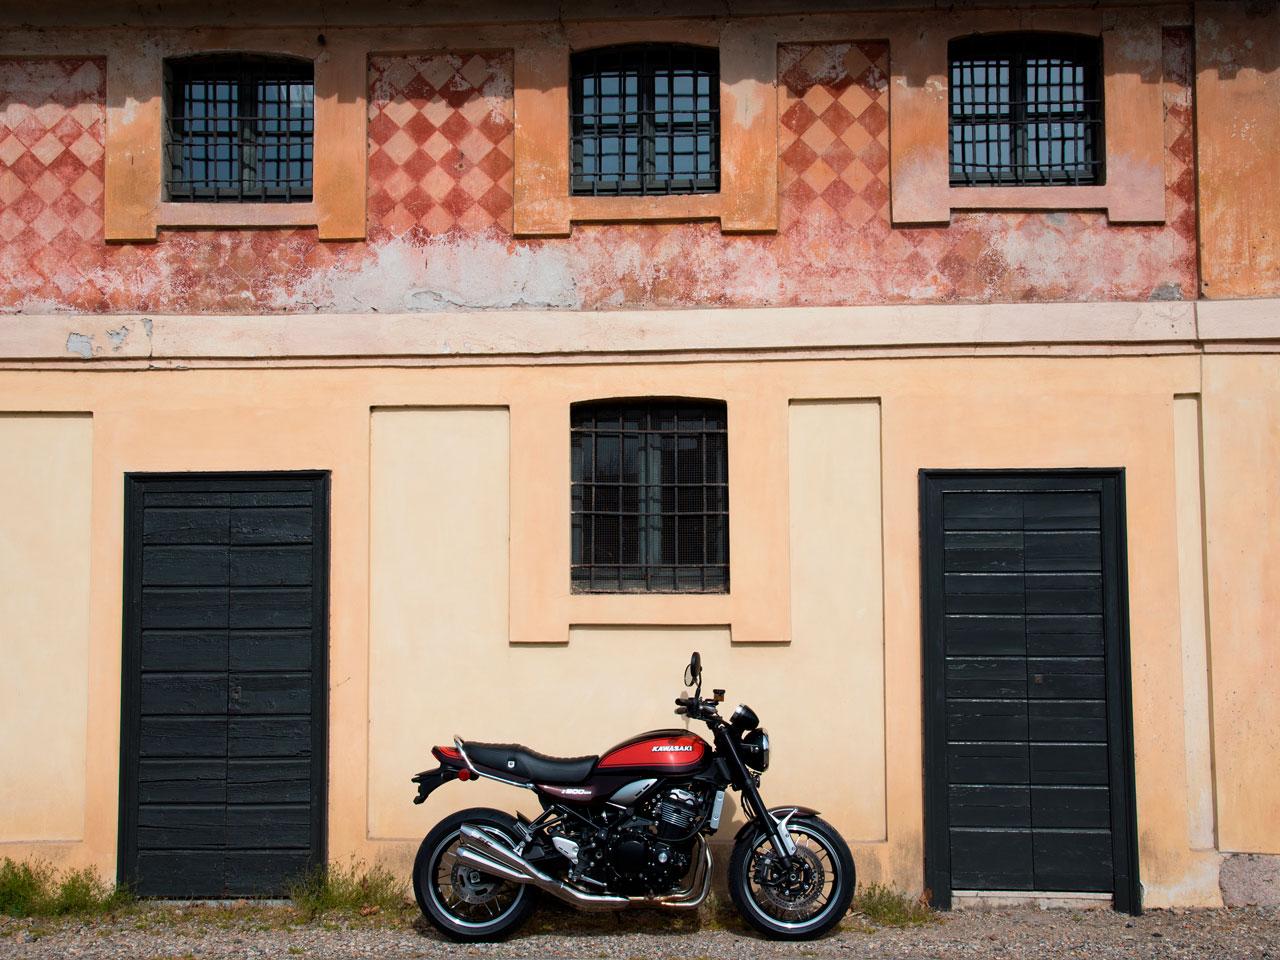 Kawasaki-Z900RS-Testanera-Esterna1_1280x960px_Web